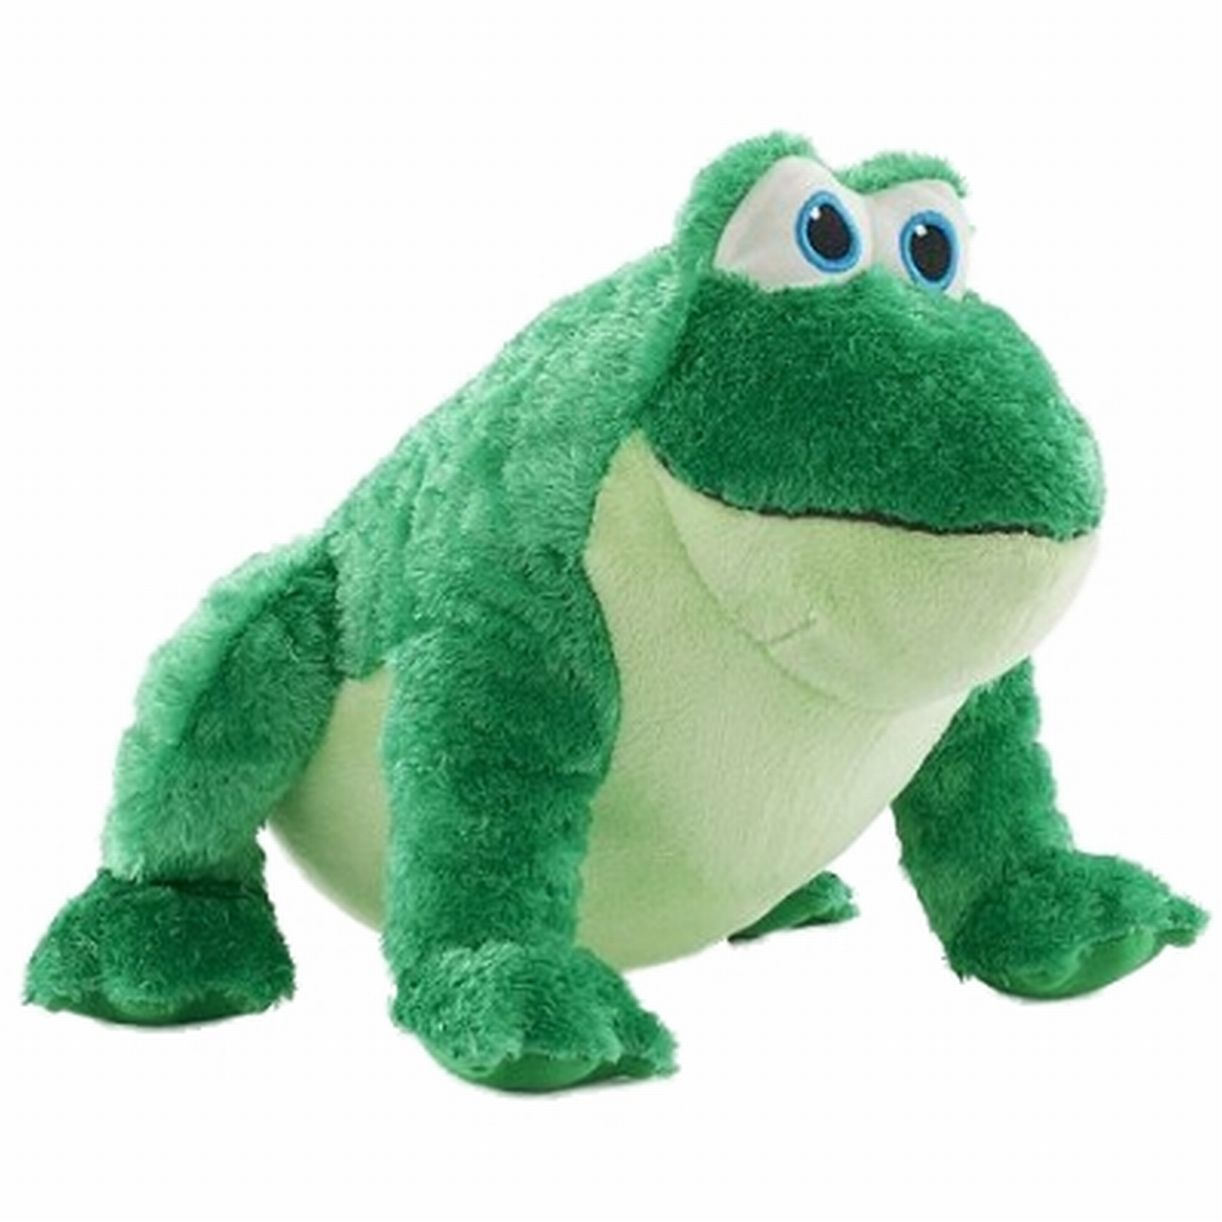 Kohls Cares Its Mine Frog Stuffed Animal Plush Pal Green